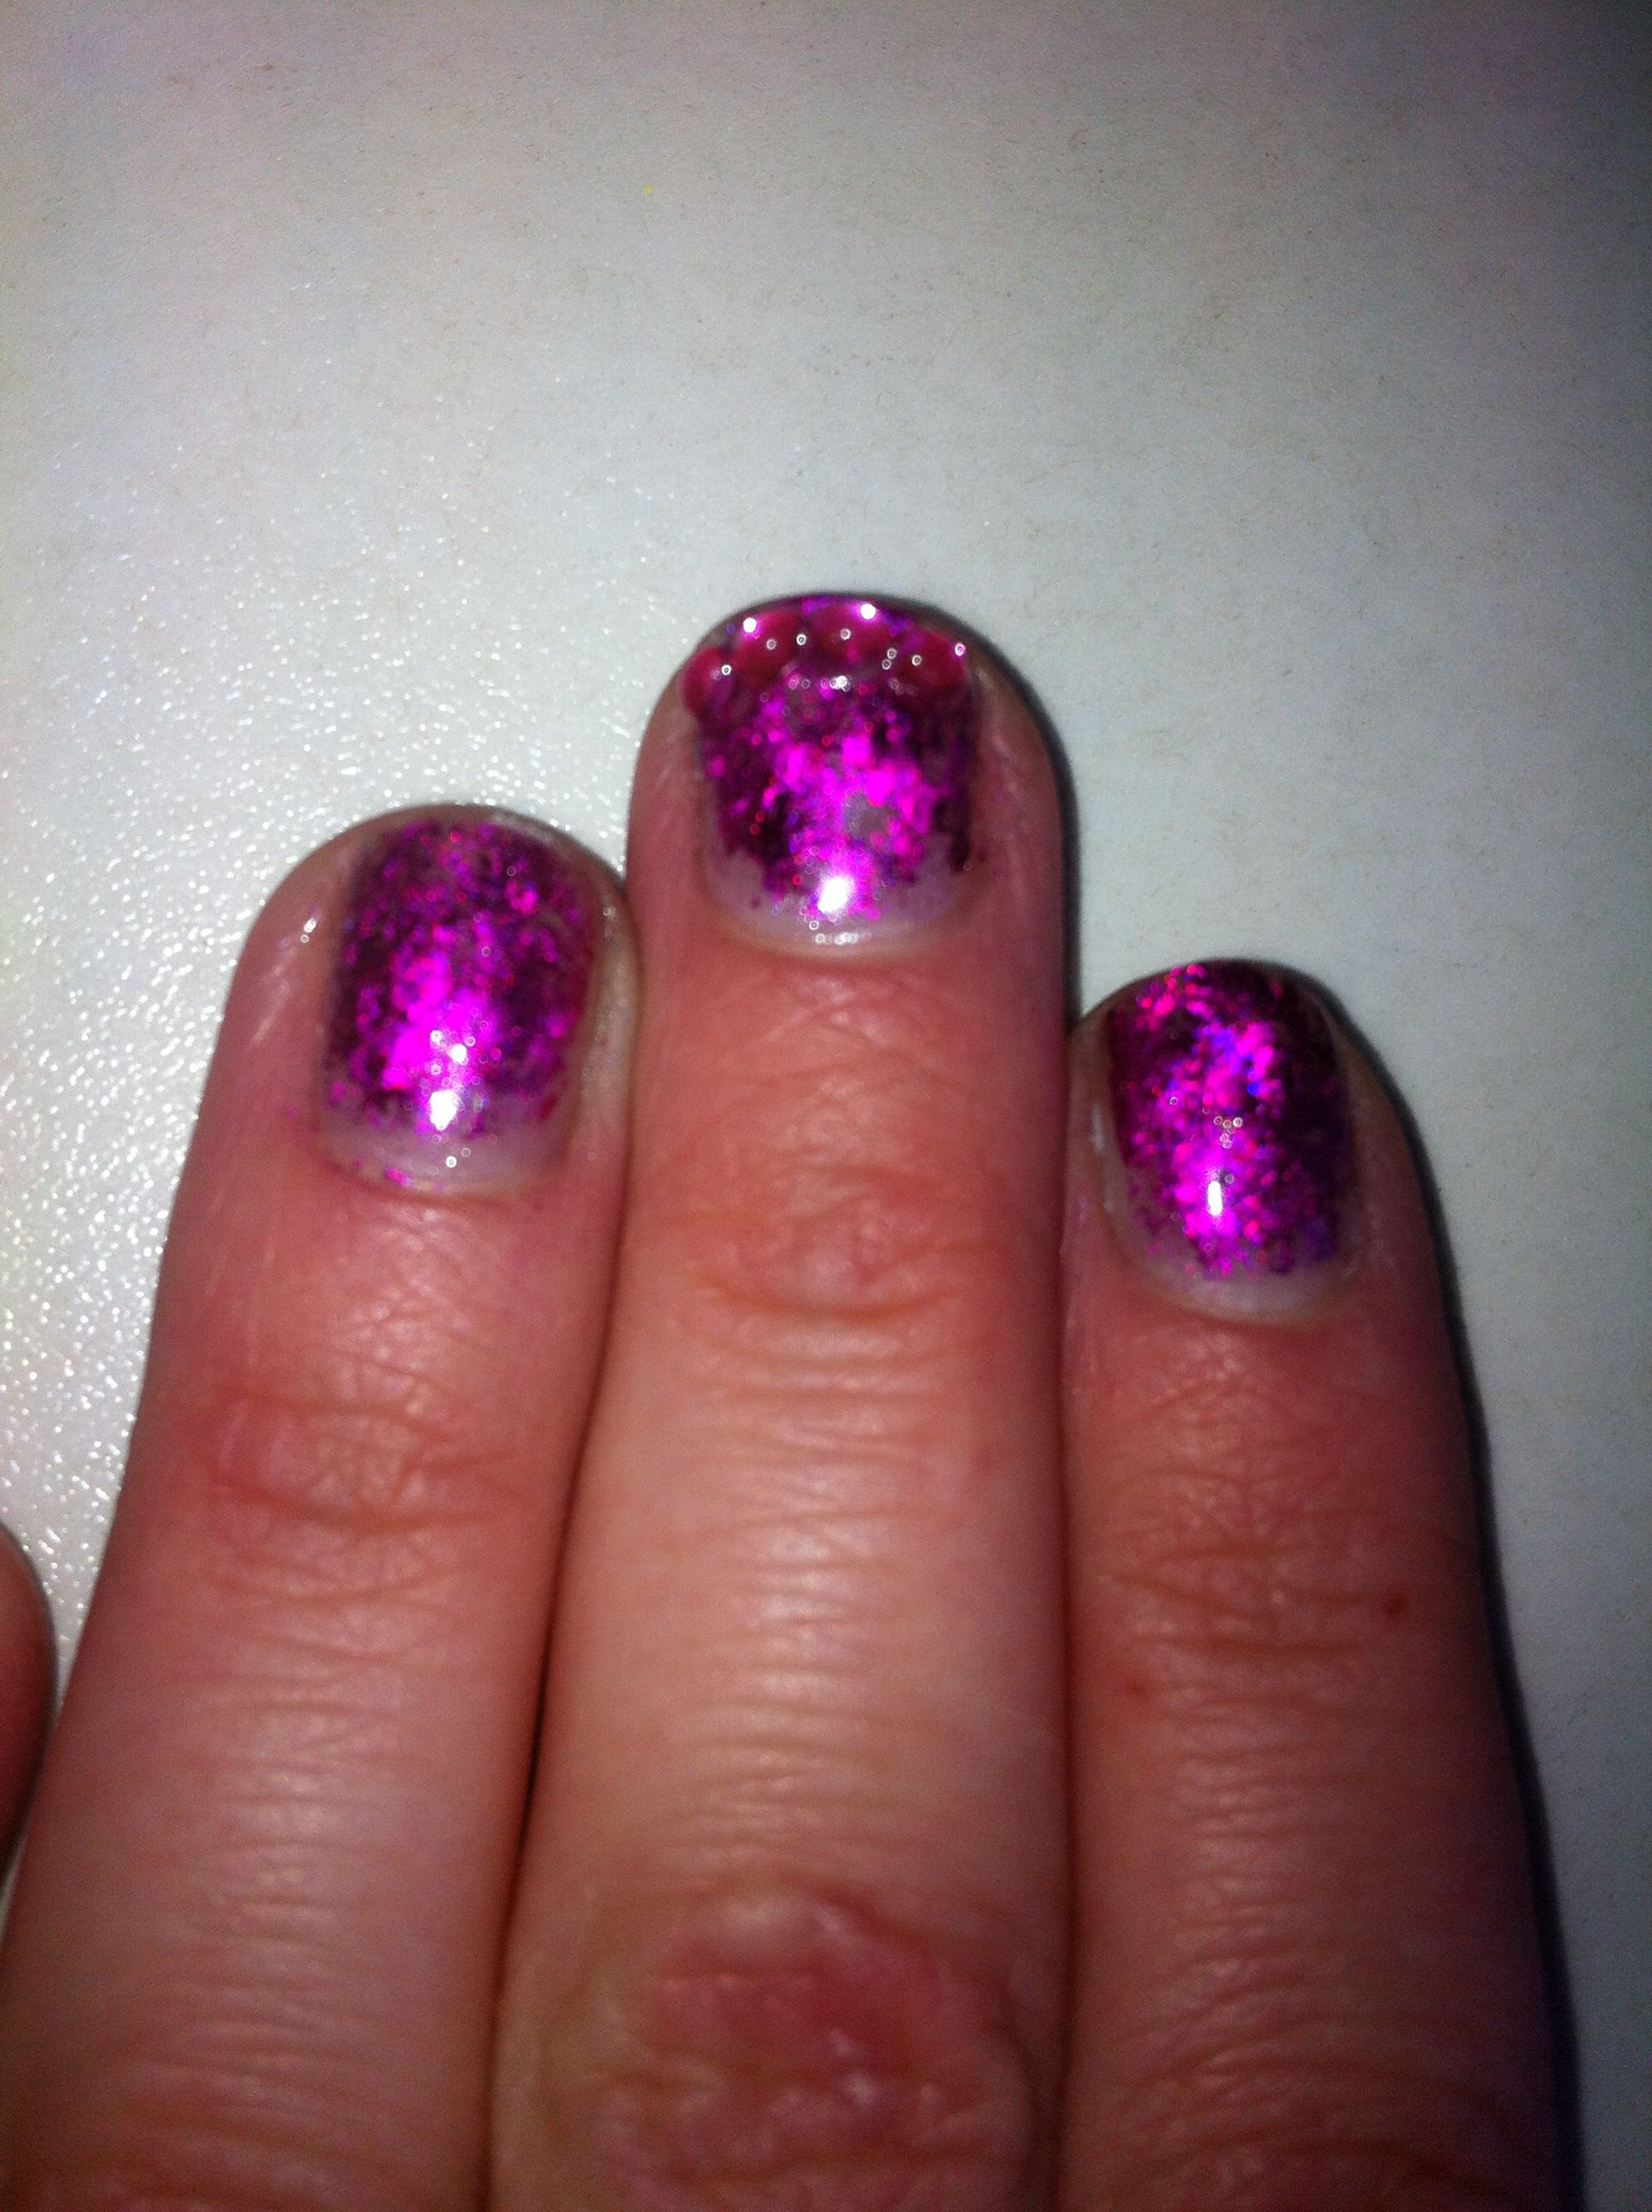 Bit messy nails diy shellac harder than it looks nails pinterest bit messy nails diy shellac harder than it looks solutioingenieria Choice Image